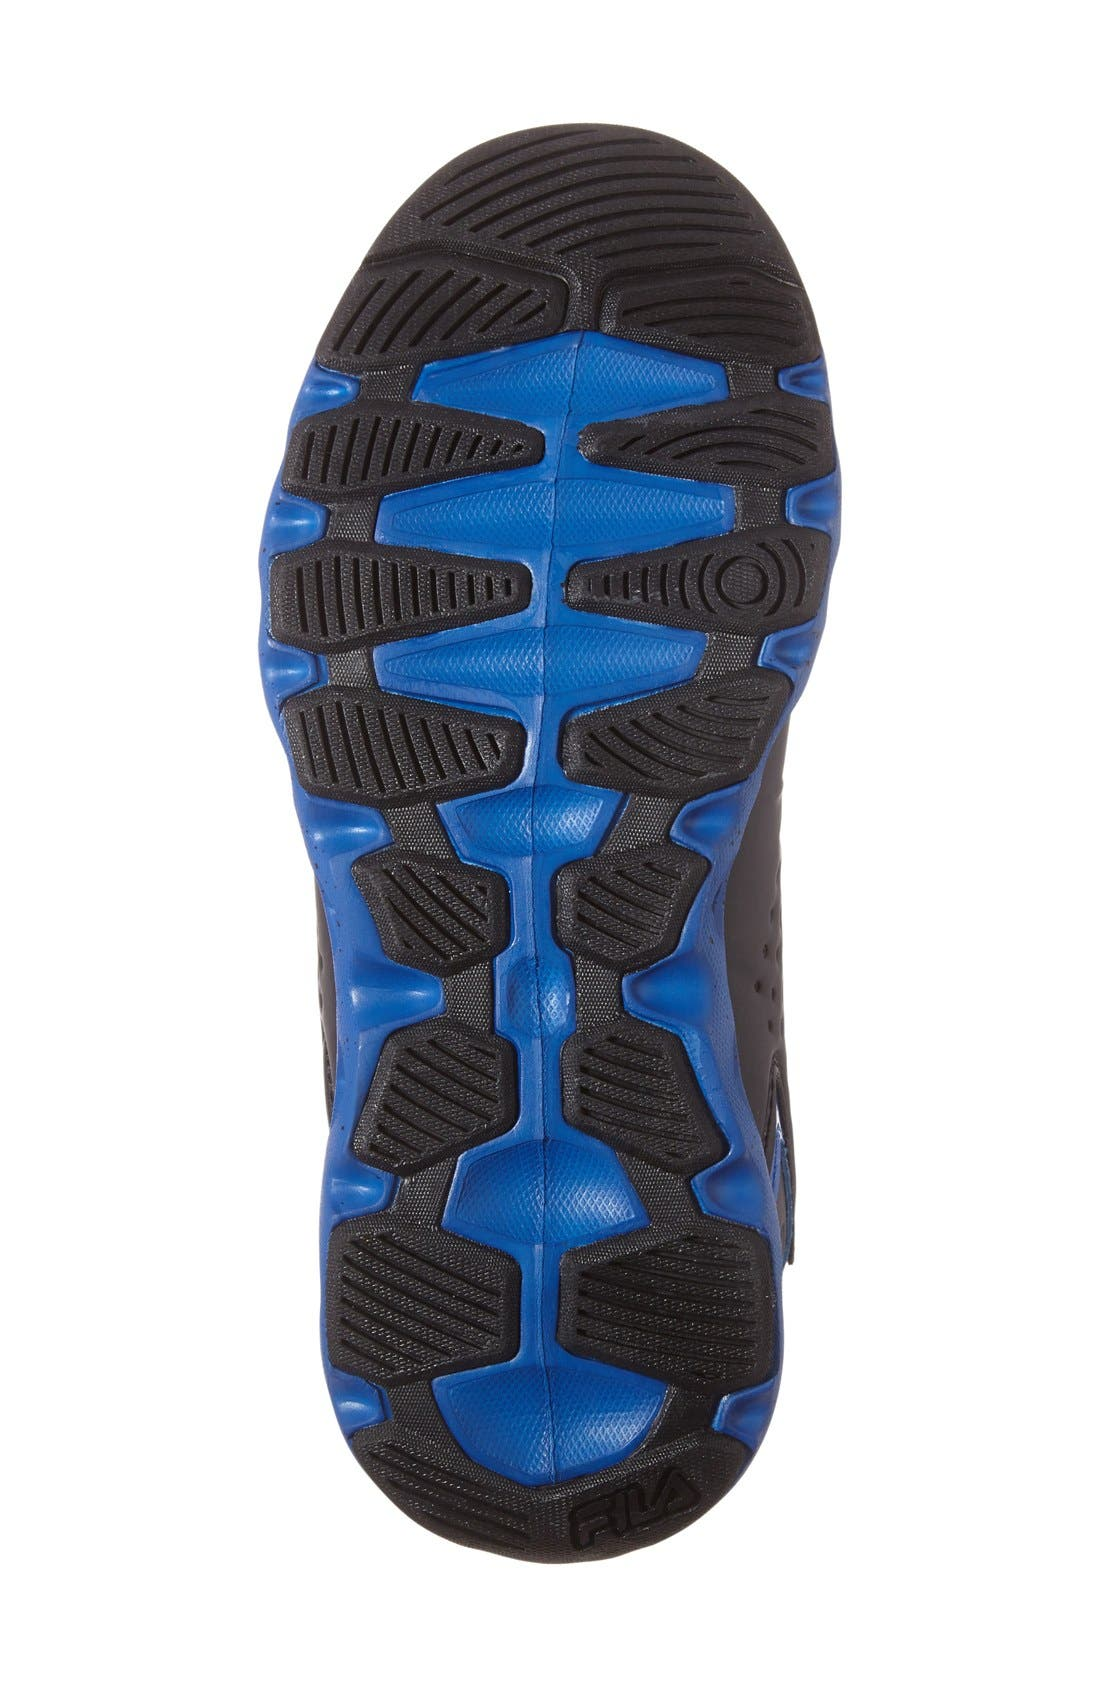 FILA,                             Big Bang High Top Sneaker,                             Alternate thumbnail 4, color,                             001